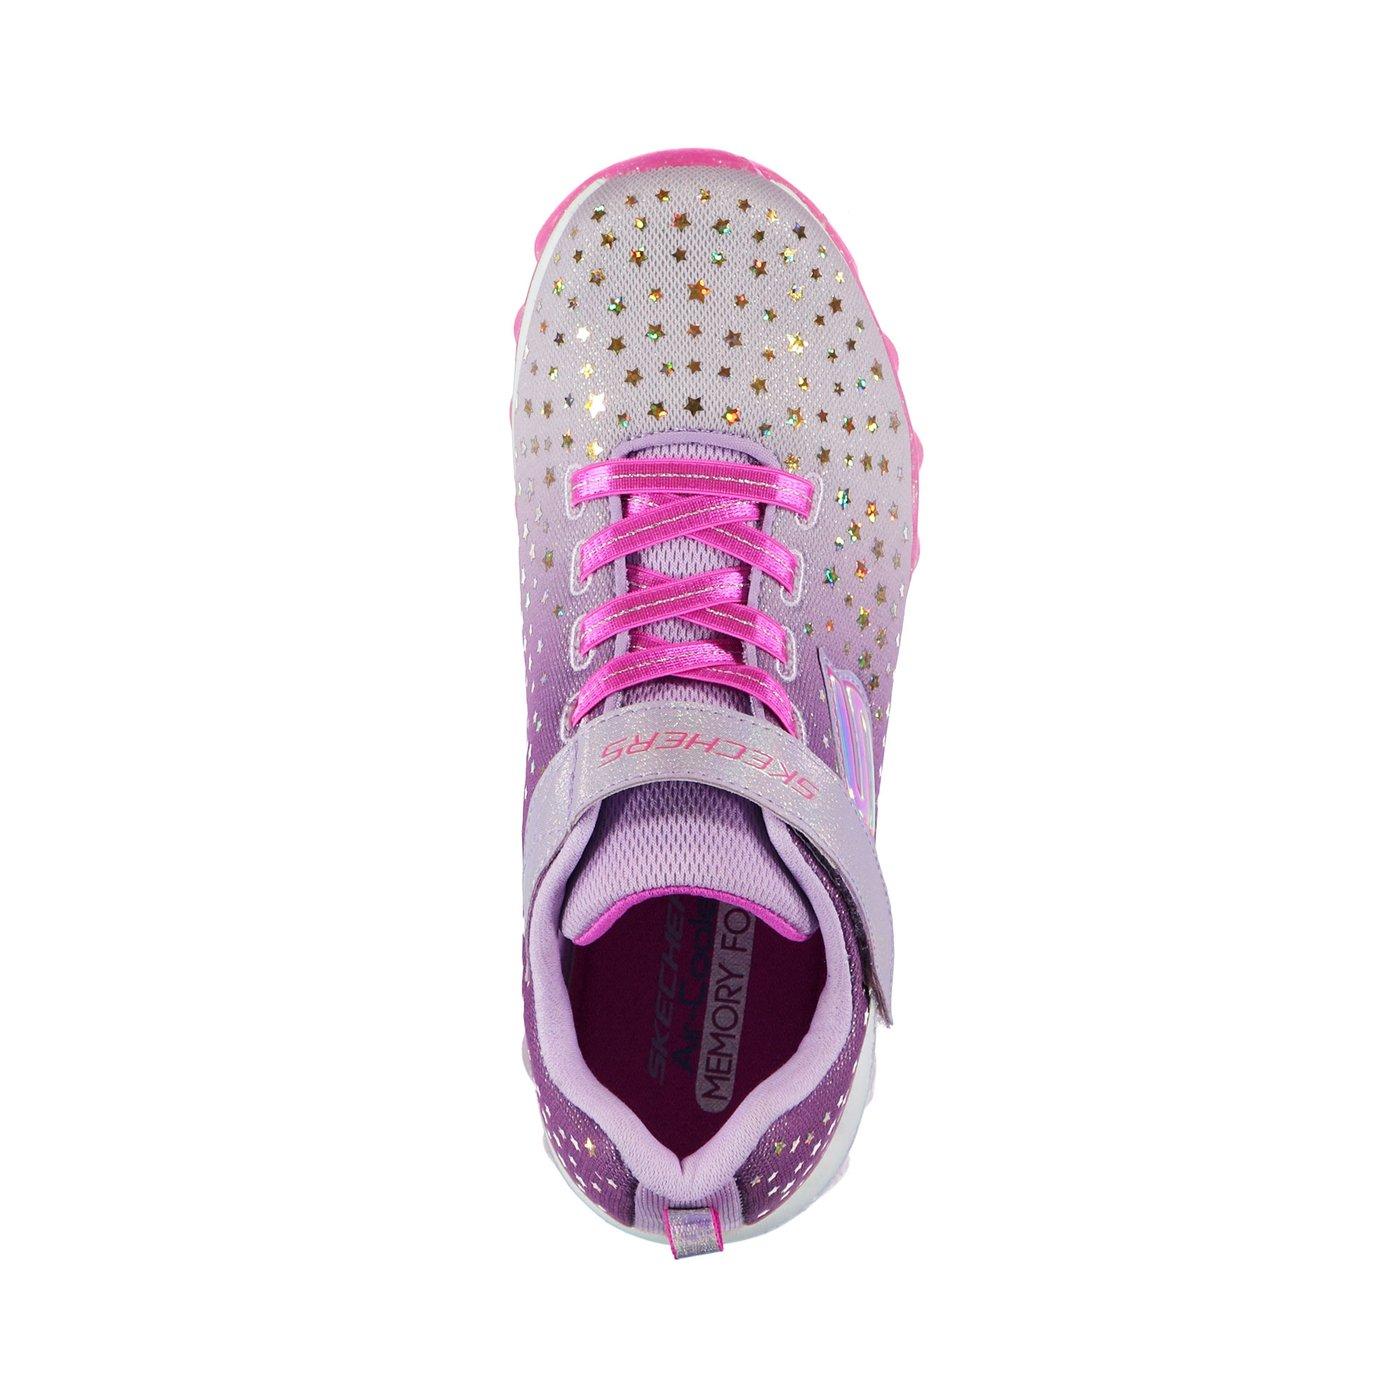 Skechers Skech-Air- Star Jumper Kız Çocuk Lavanta-Pembe Spor Ayakkabı